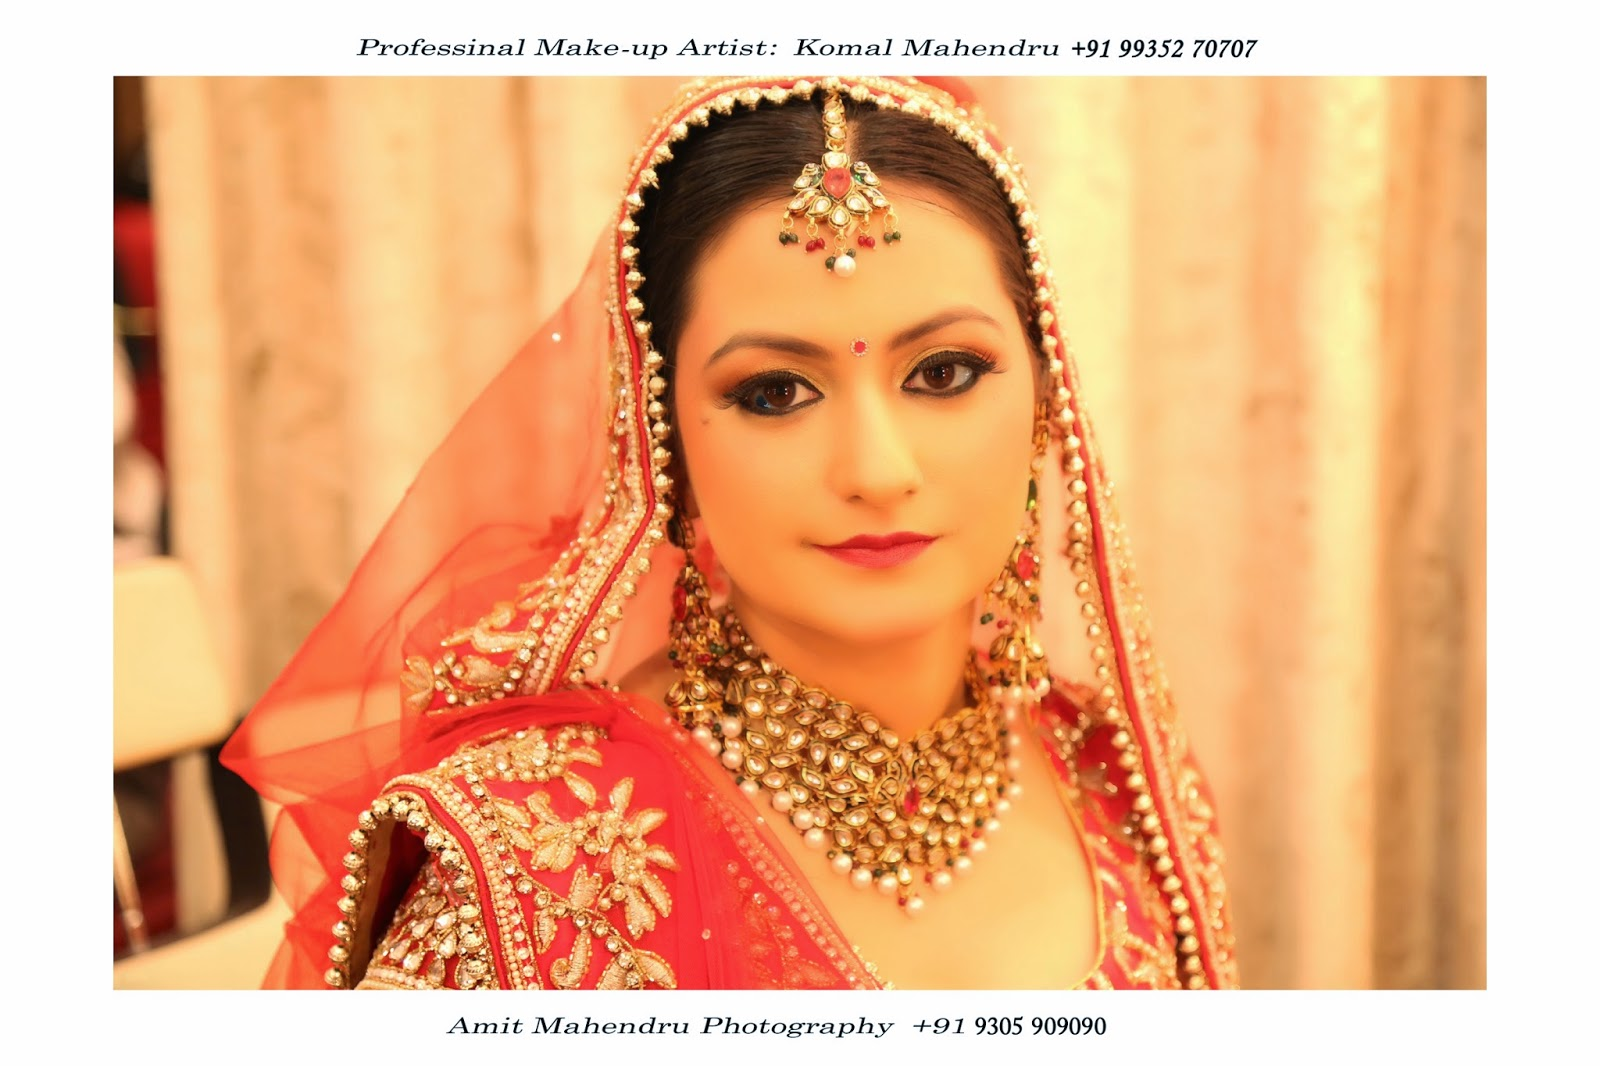 komal mahendru's professional makeup - lucknow, india